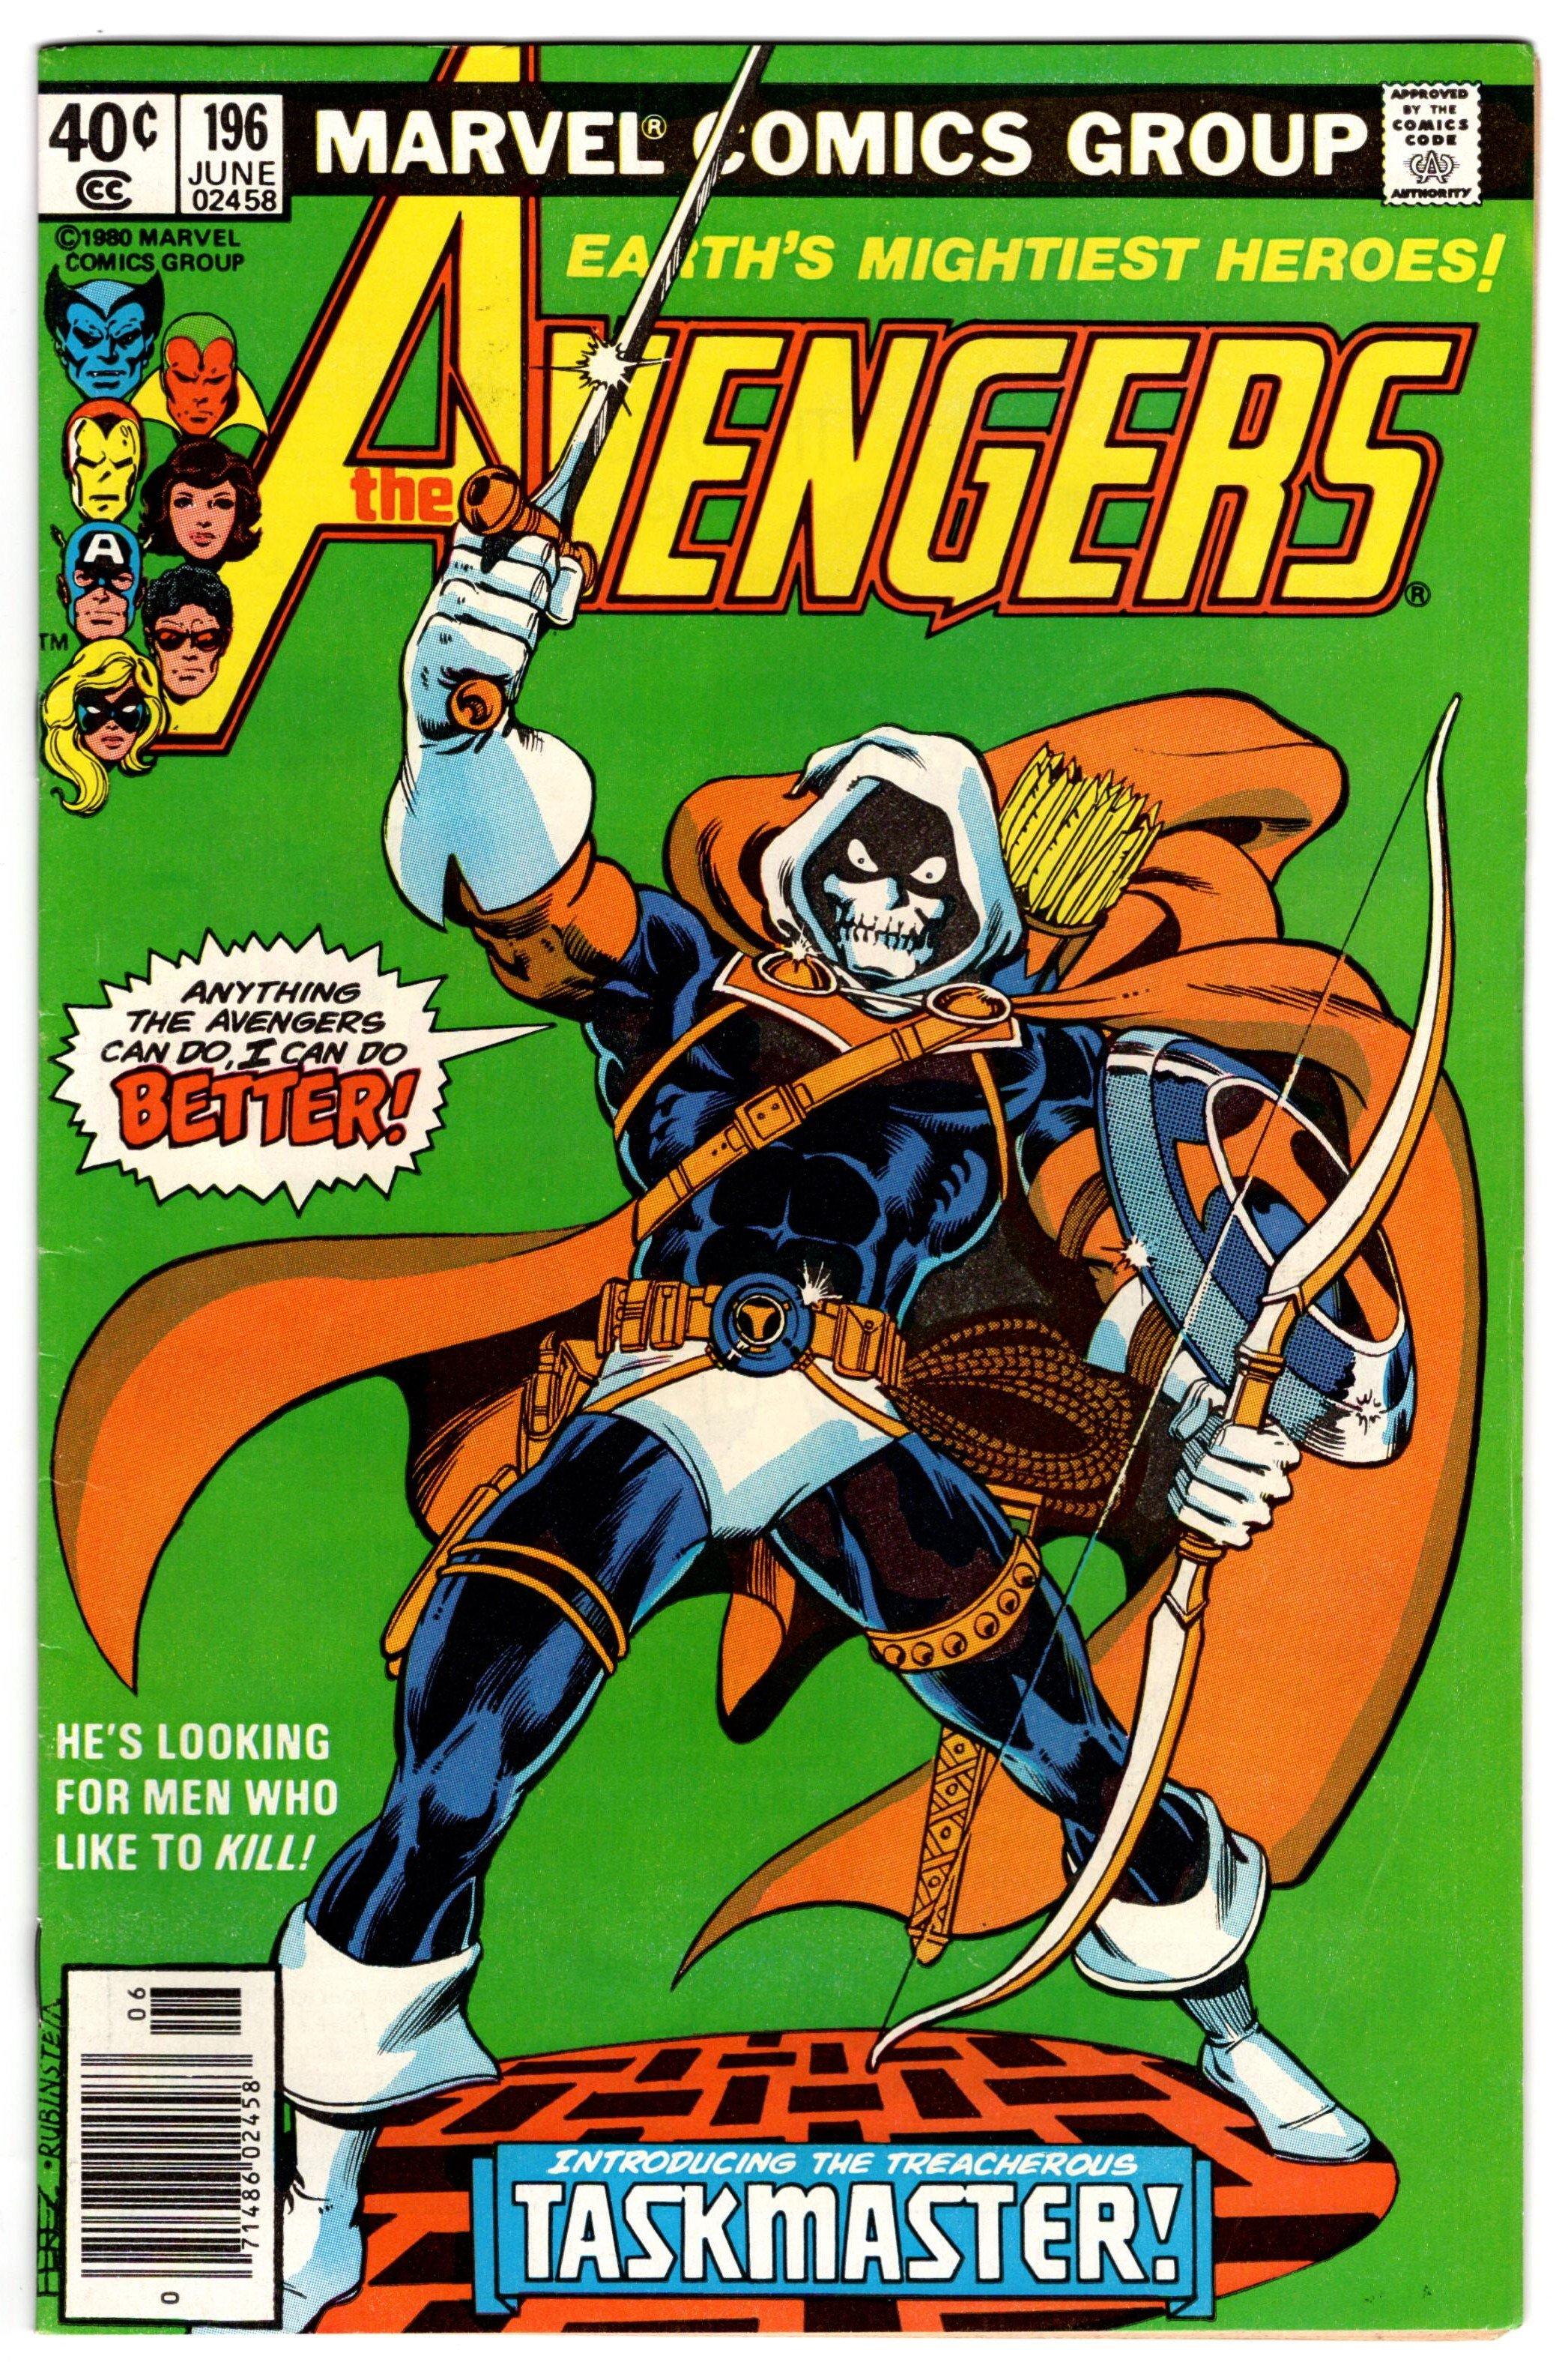 Taskmaster The Avengers 196 1980 George Perez art Black Widow movie